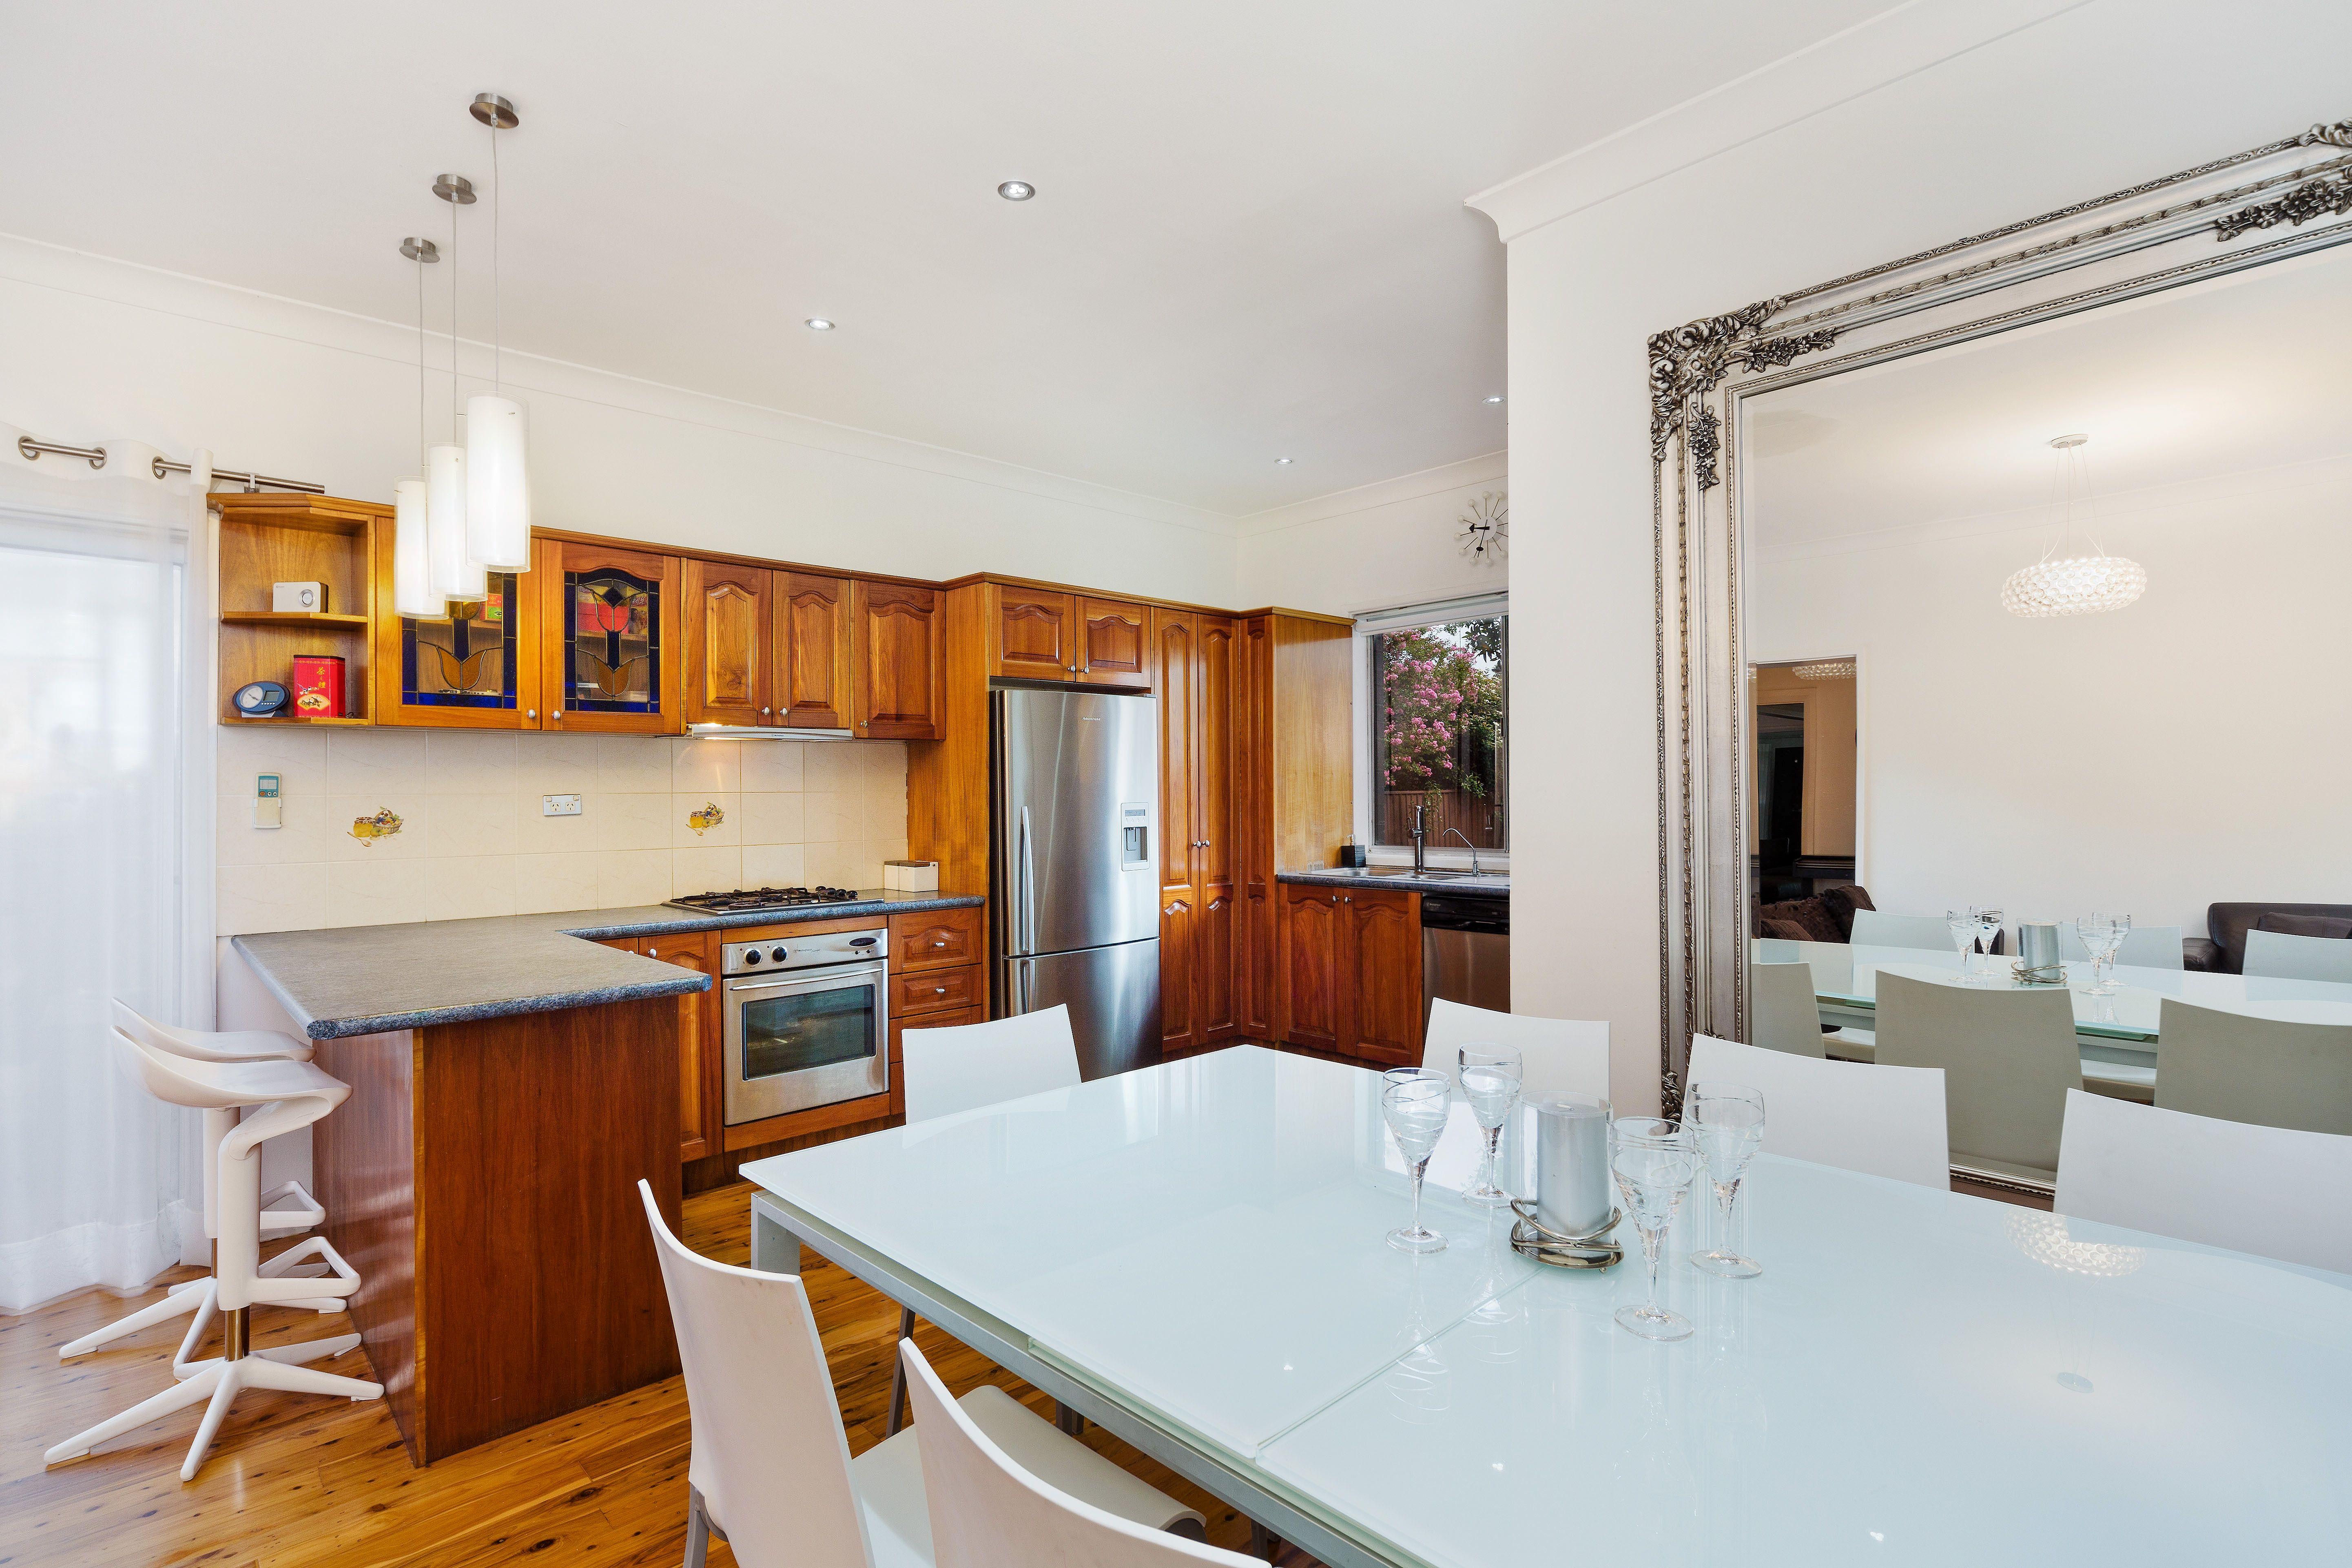 11 Brussels Street, North Strathfield NSW 2137